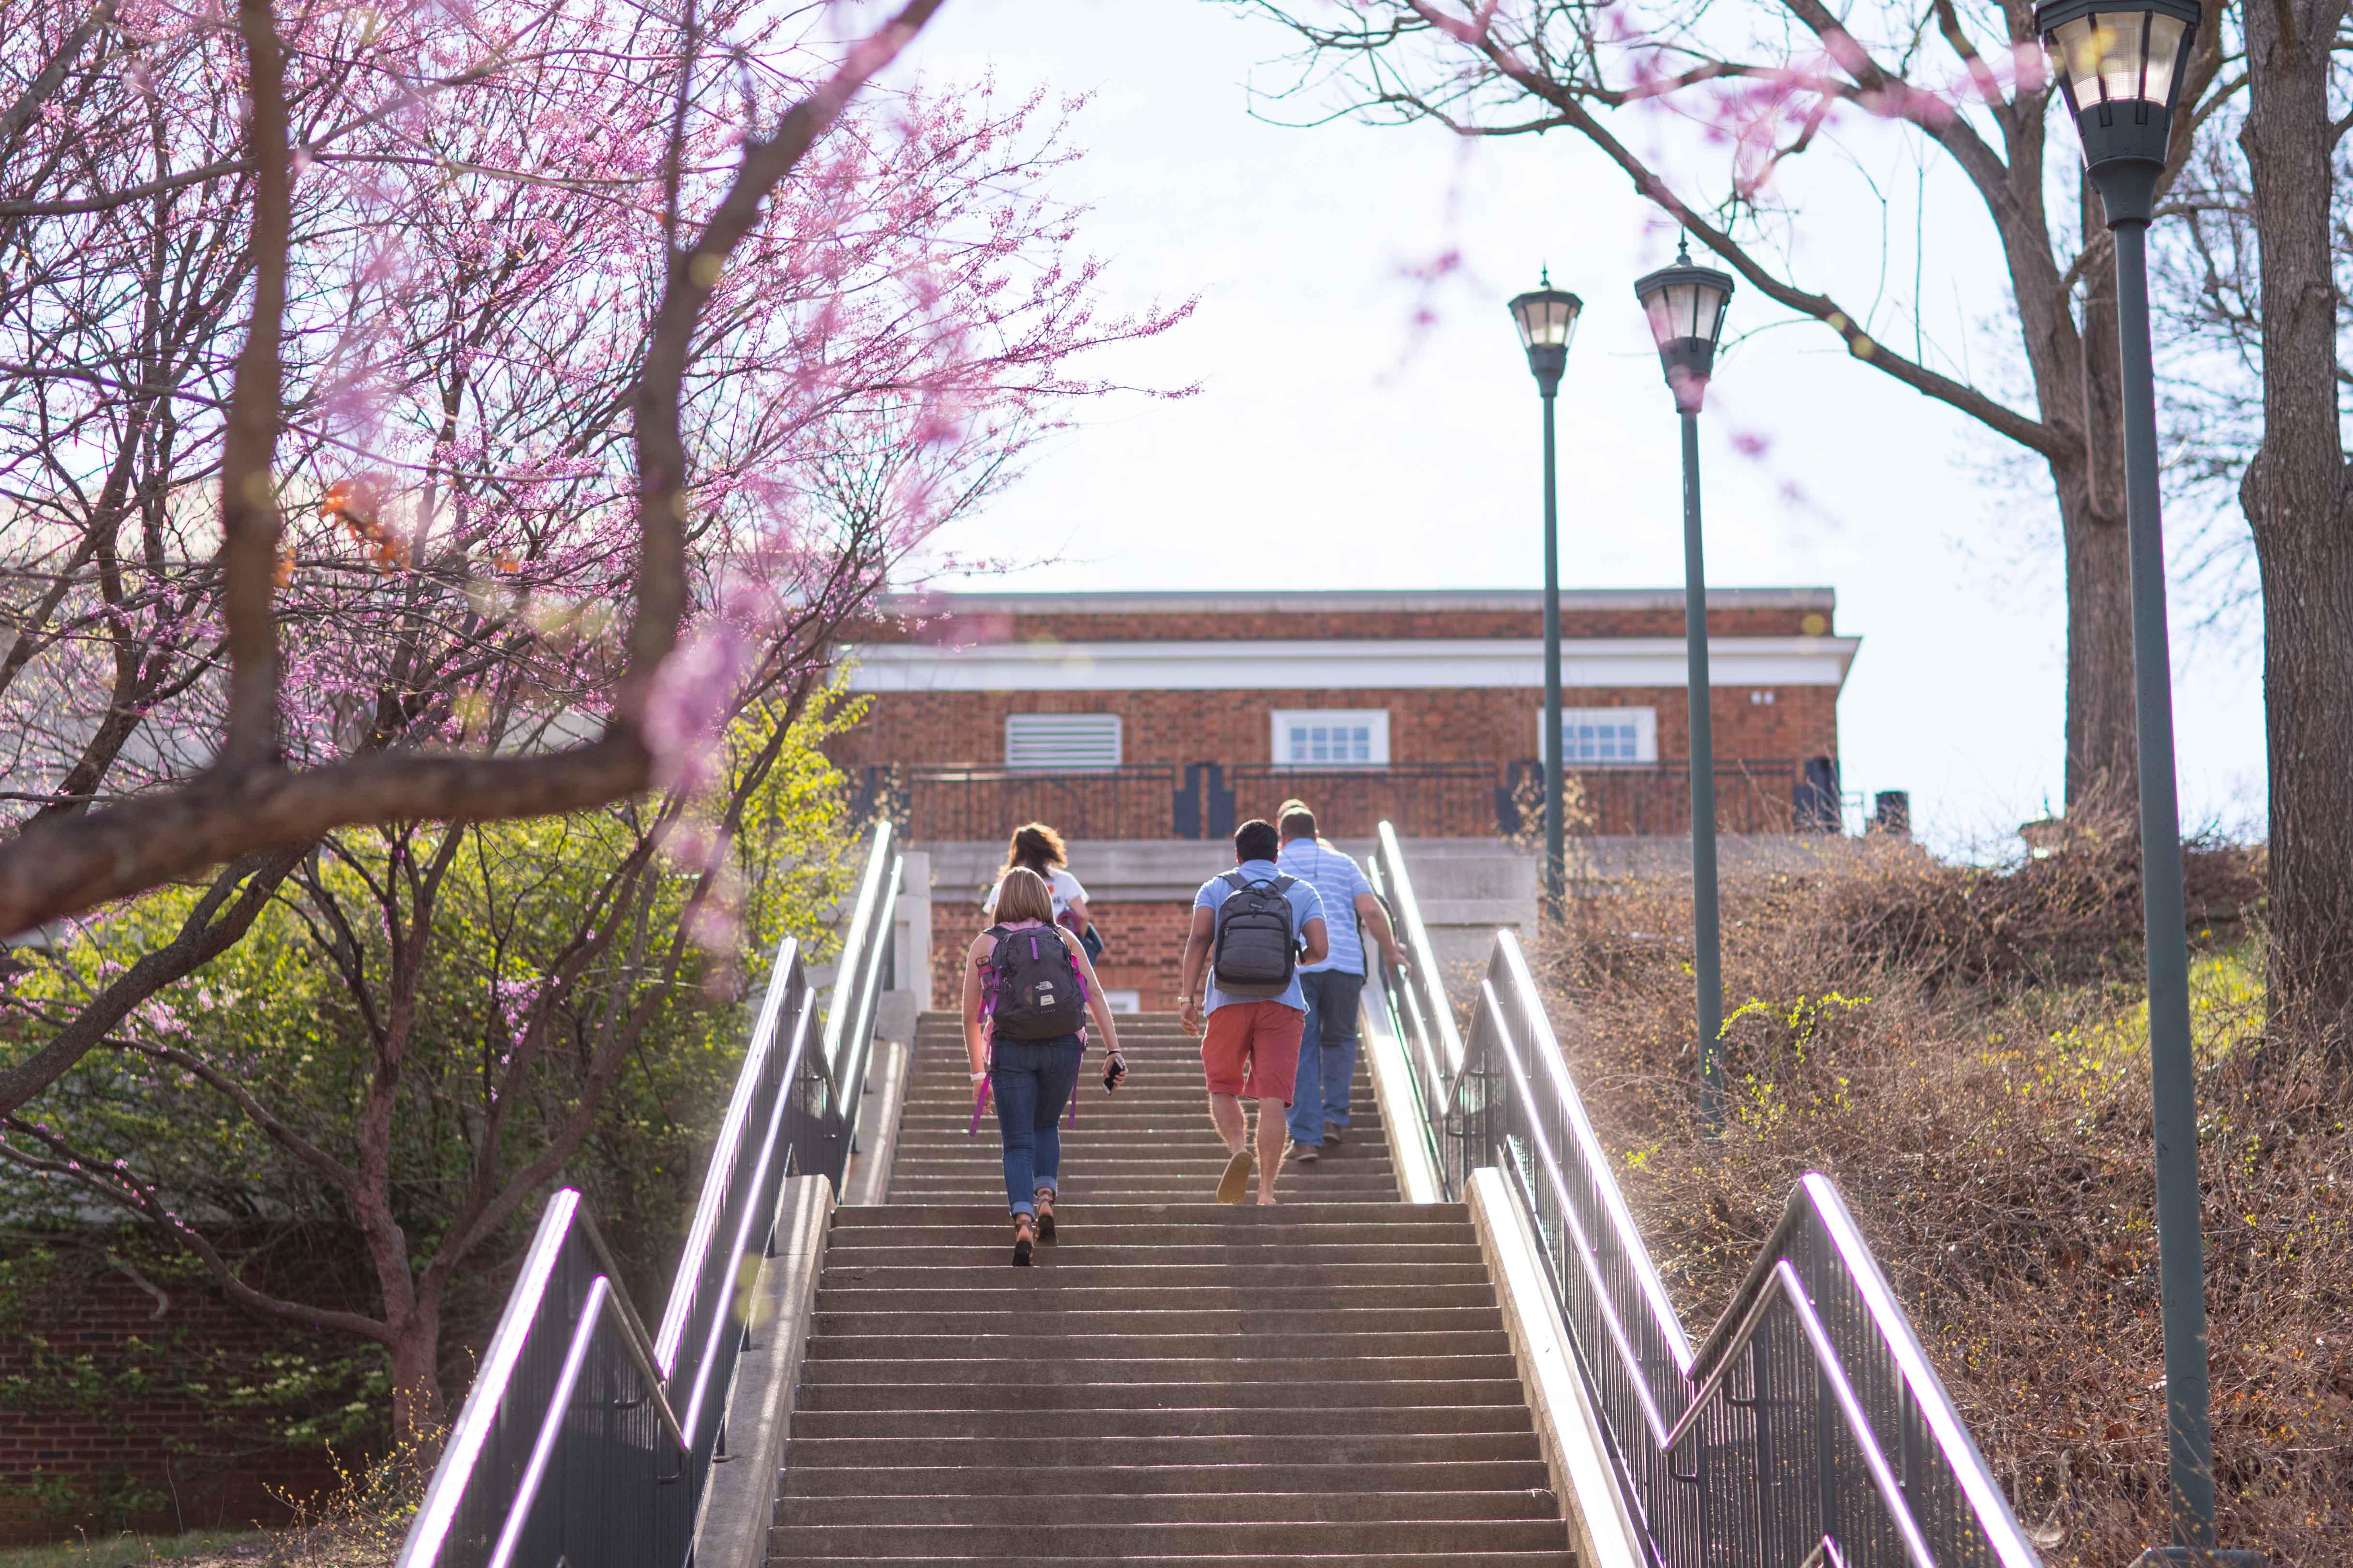 Students walking outside